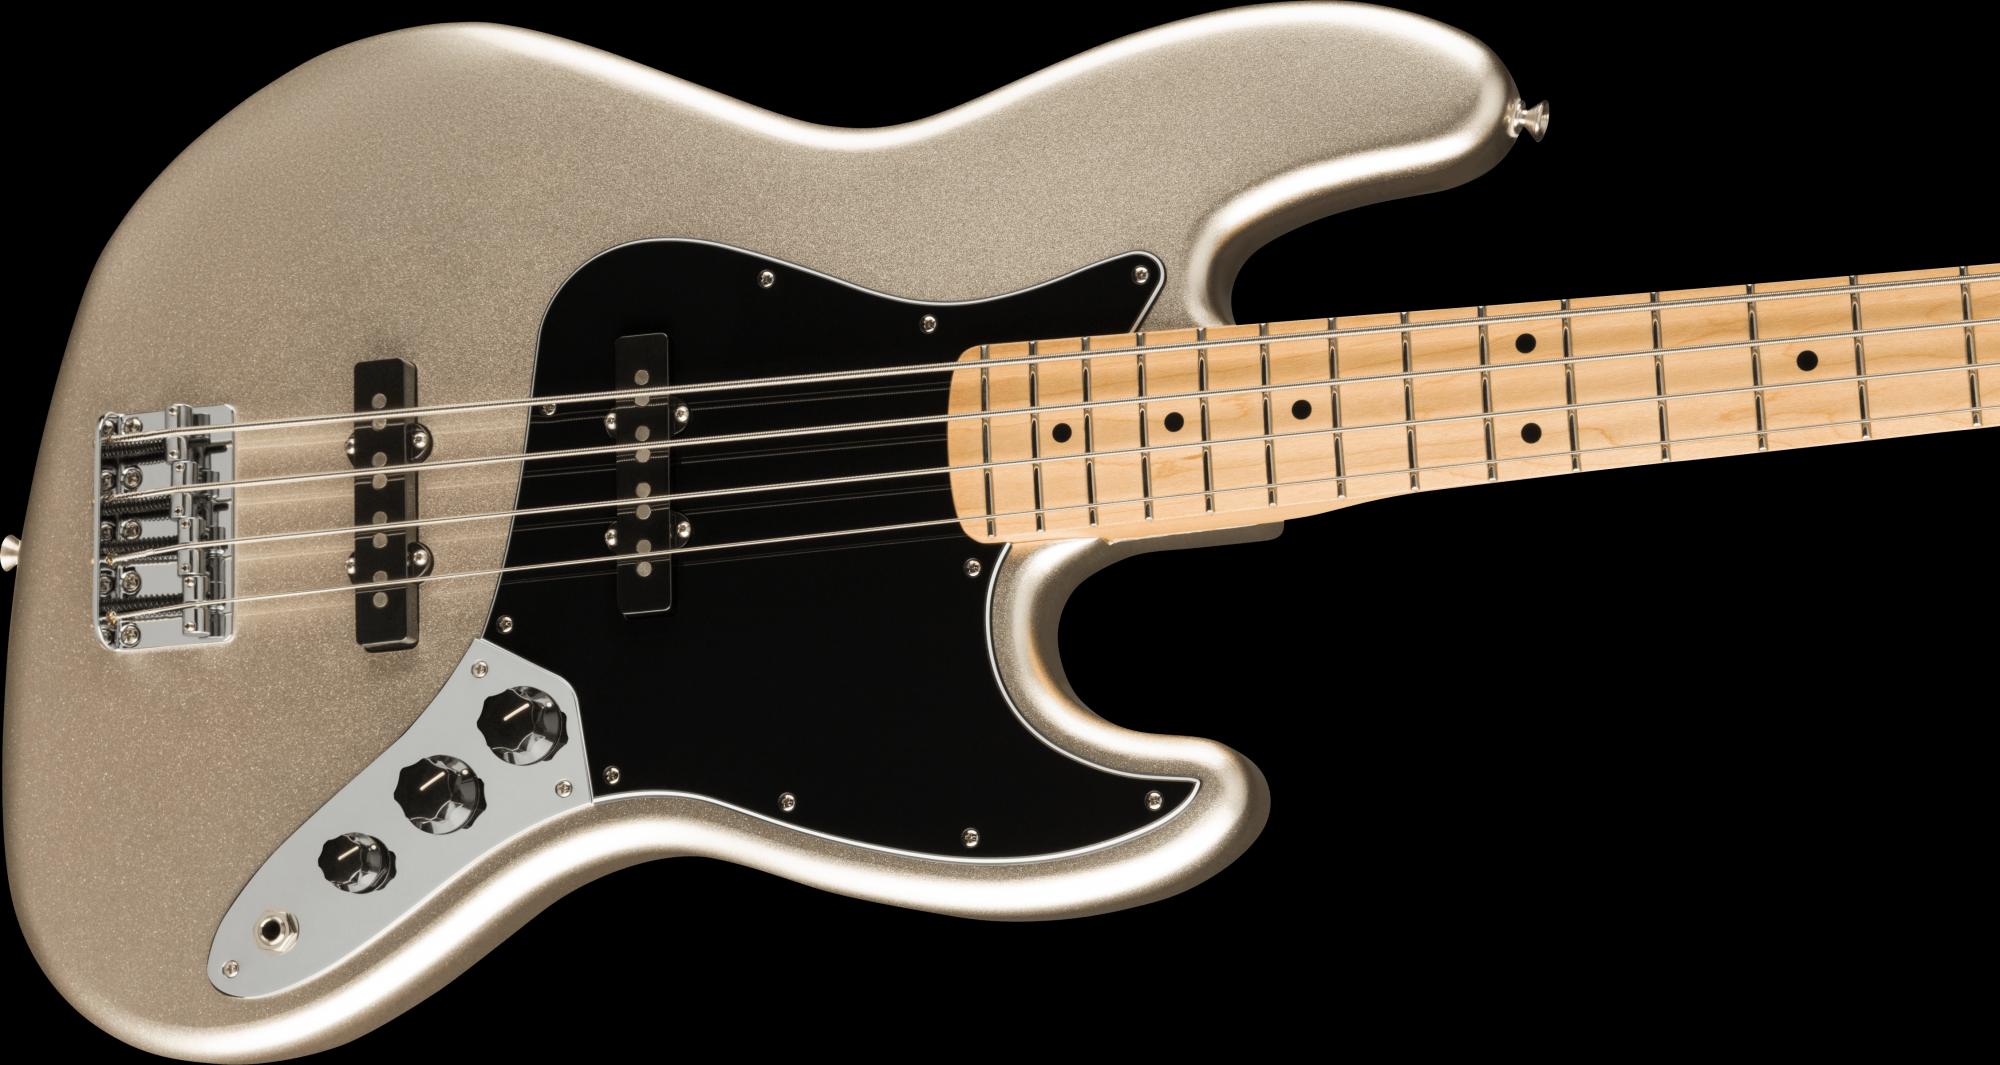 PRE-ORDER: Fender 75th Anniversary Jazz Bass Maple Fingerboard - Diamond Anniversary